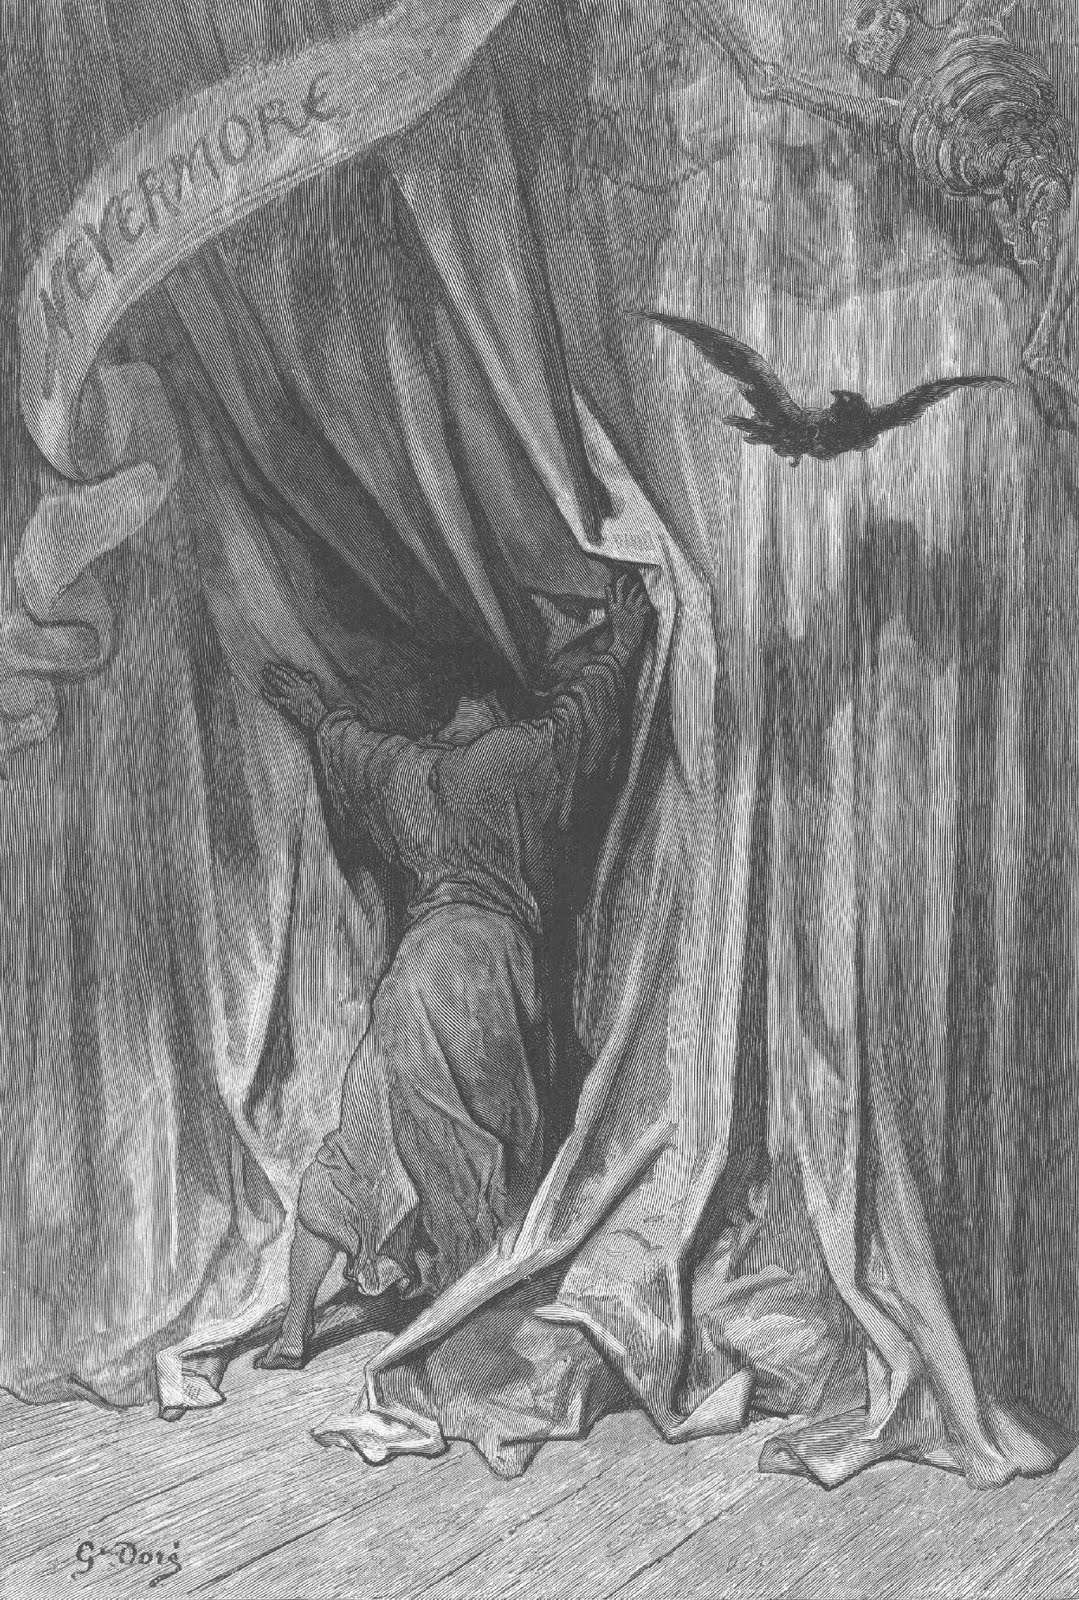 The Raven Edgar Allan Poe  Jur Kuipers The Raven Edgar Allan Poe